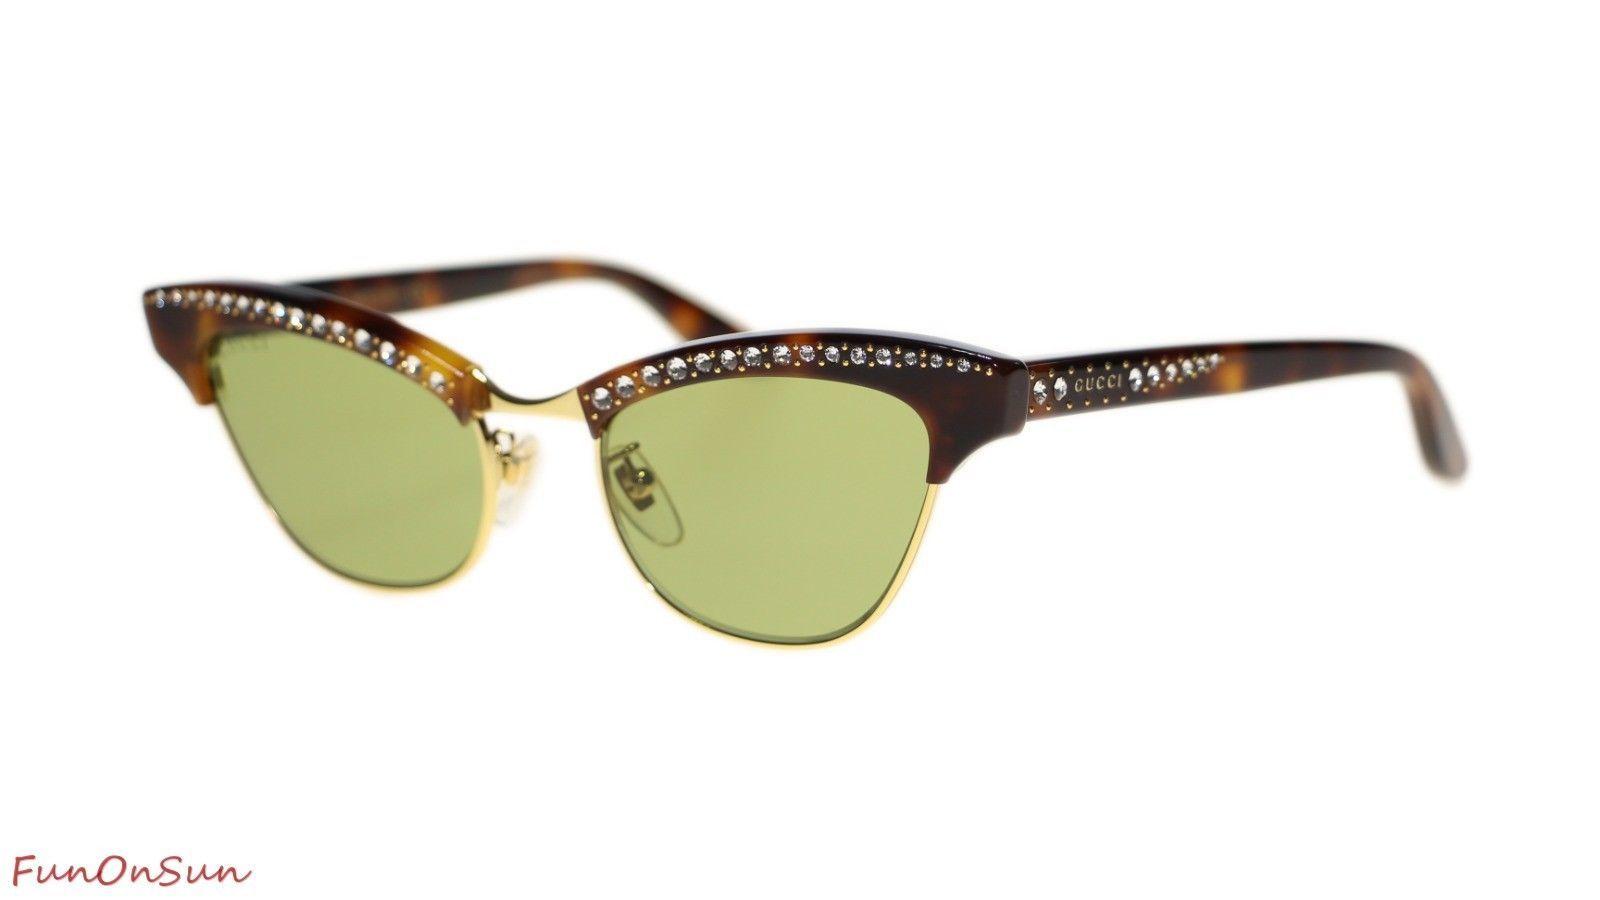 302ce407822 10. 10. Previous. New Gucci Women Sunglasses GG0153S 003 Havana Green  Polarized Lens 49mm